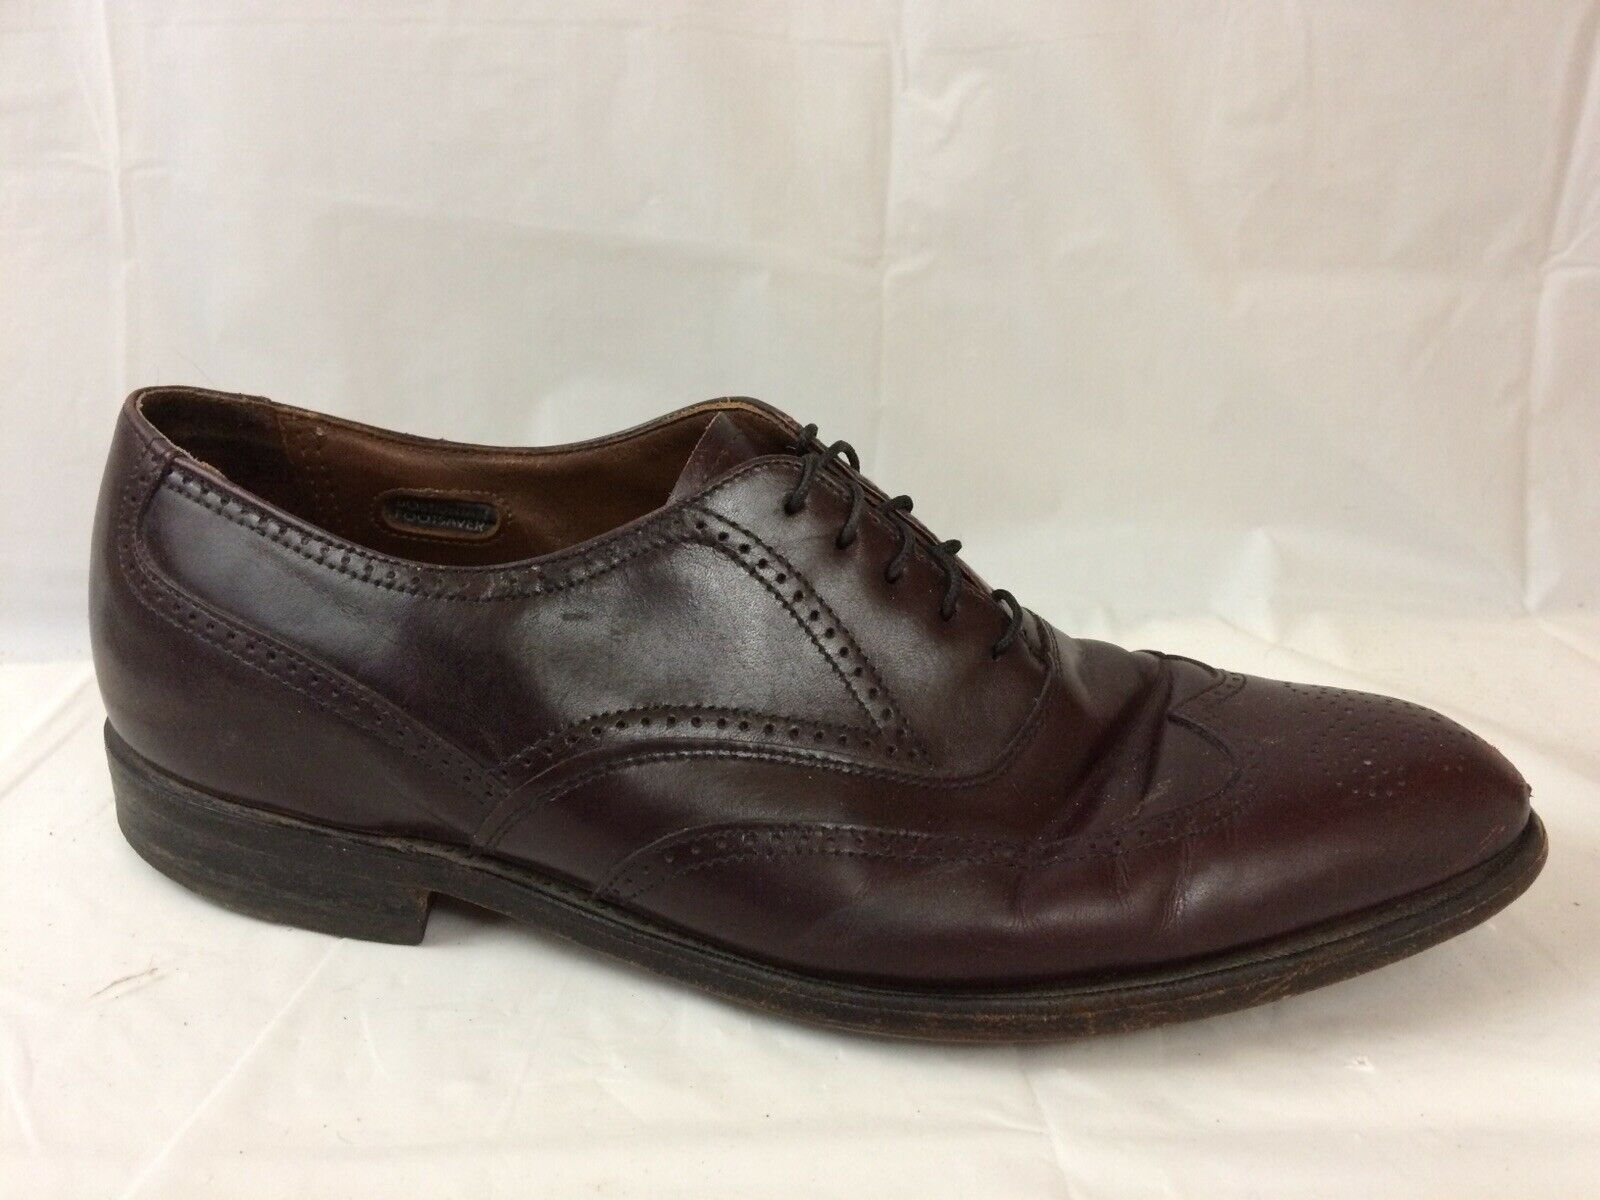 Bostonian Mens 11 E C Wide Narrow Burgundy Leather Wingtip Oxford Dress shoes USA